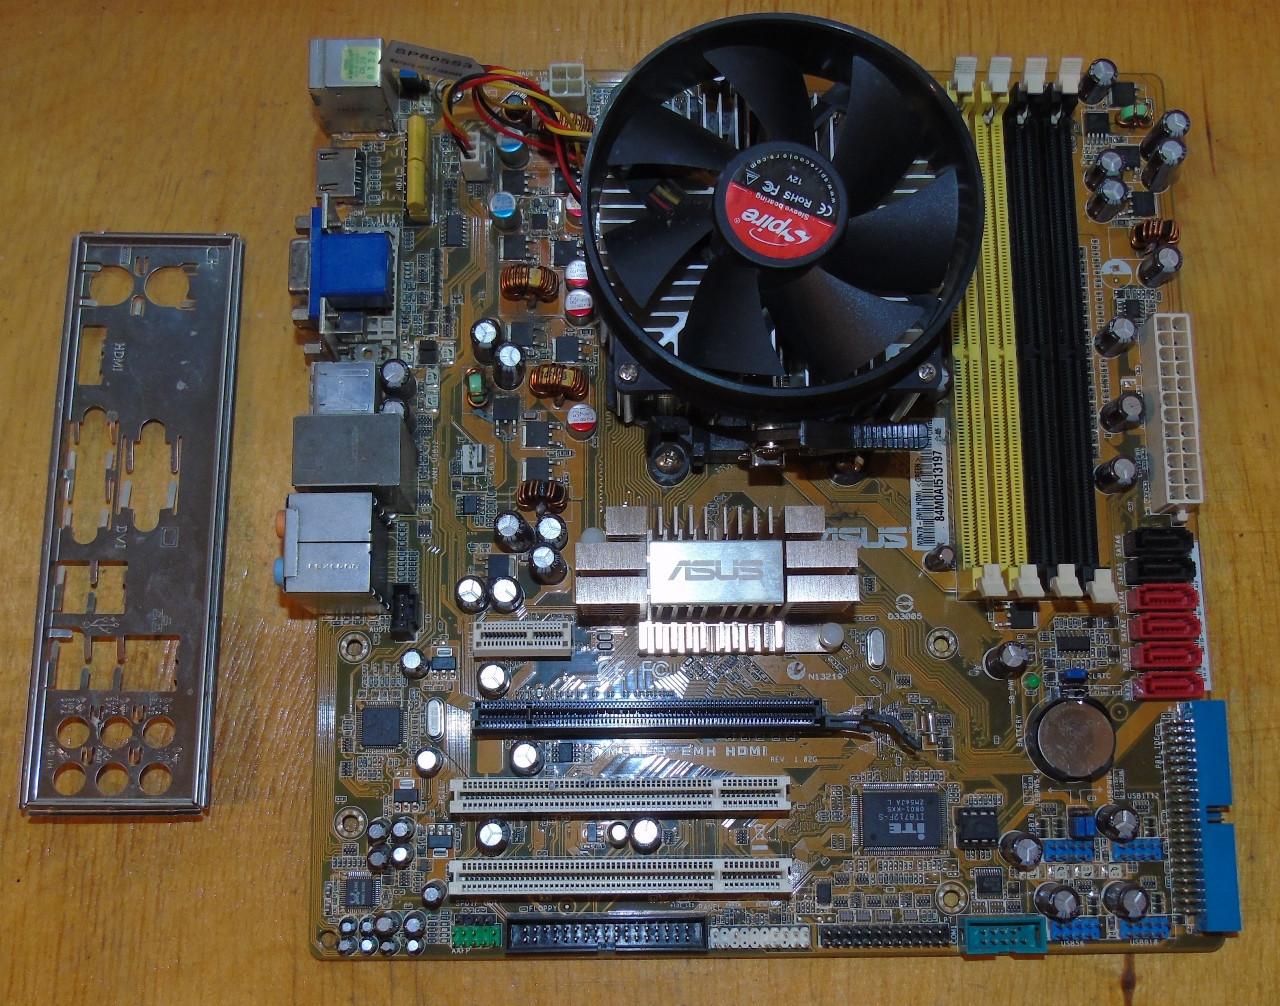 AM3 Материнская плата Asus M3N78-EMH HDMI + Процессор AMD Athlon II X3 455 @